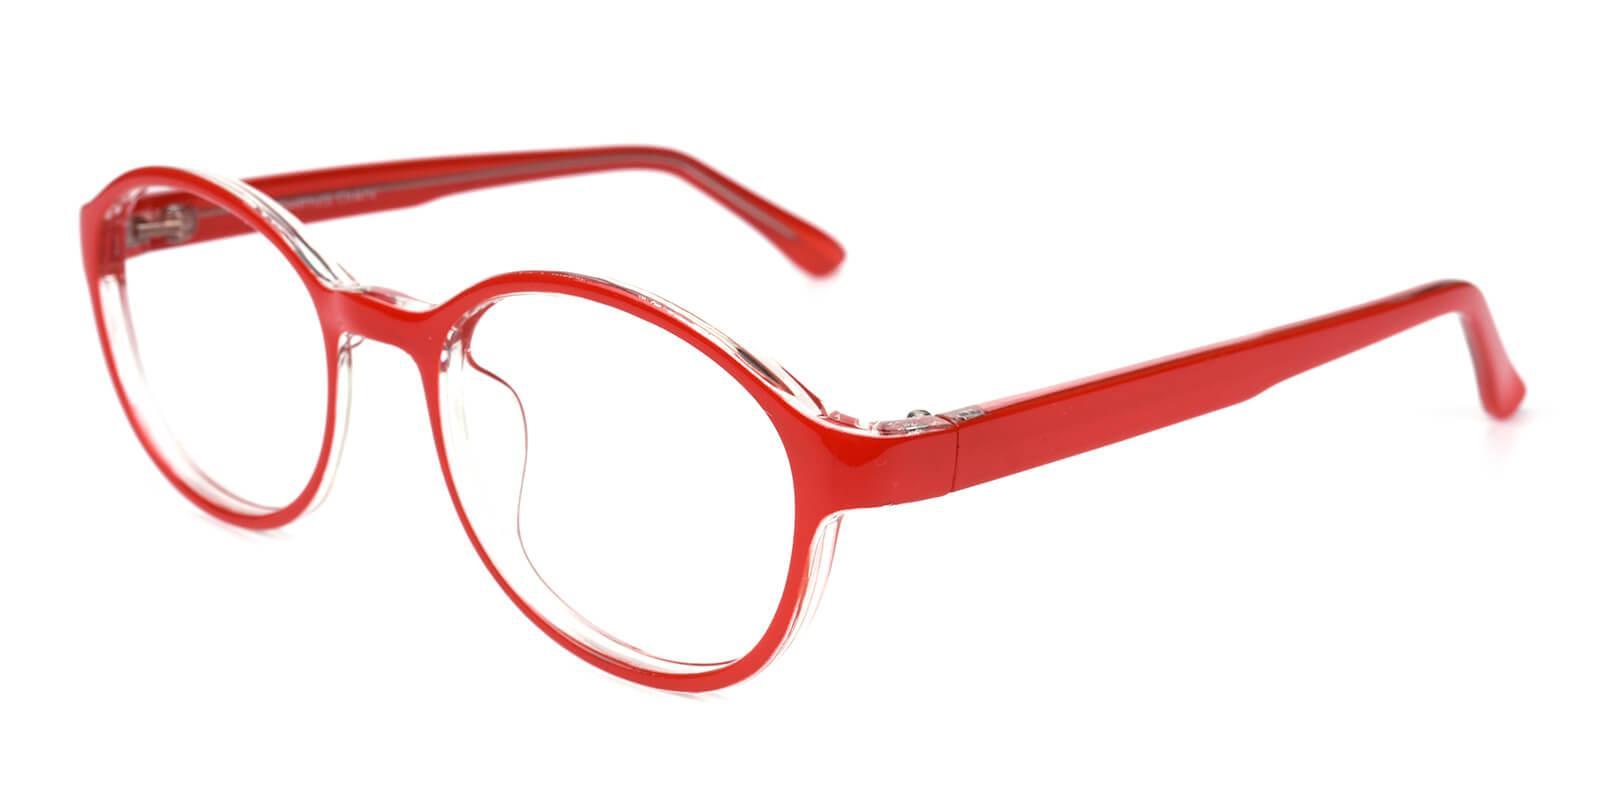 Achiever-Red-Round-Plastic-Eyeglasses-additional1